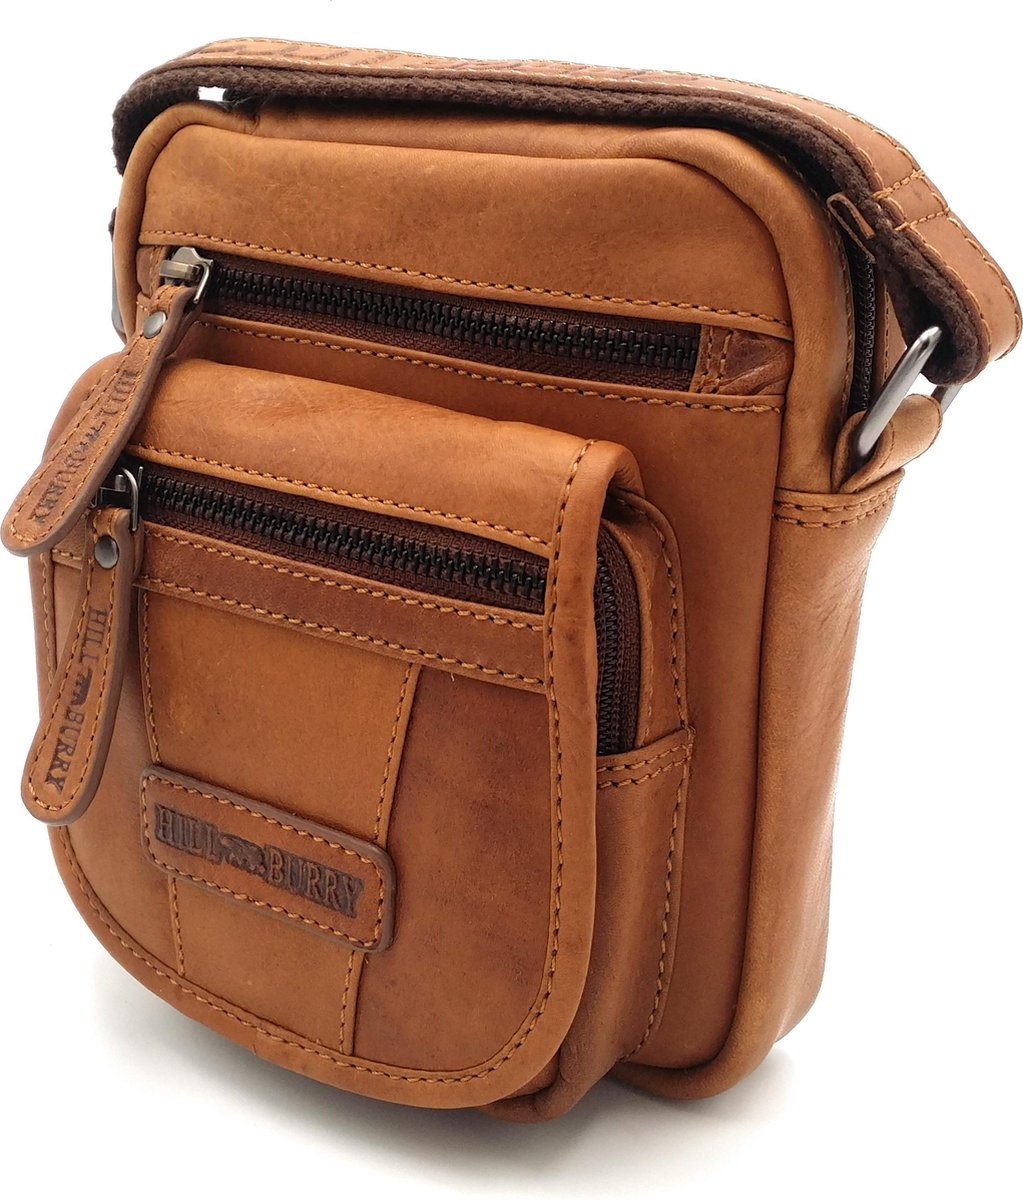 Hill Burry - VB10048 - 3112 - echt leren - schoudertas – crossbodytas- stevig - vintage leder- bruin /cognac